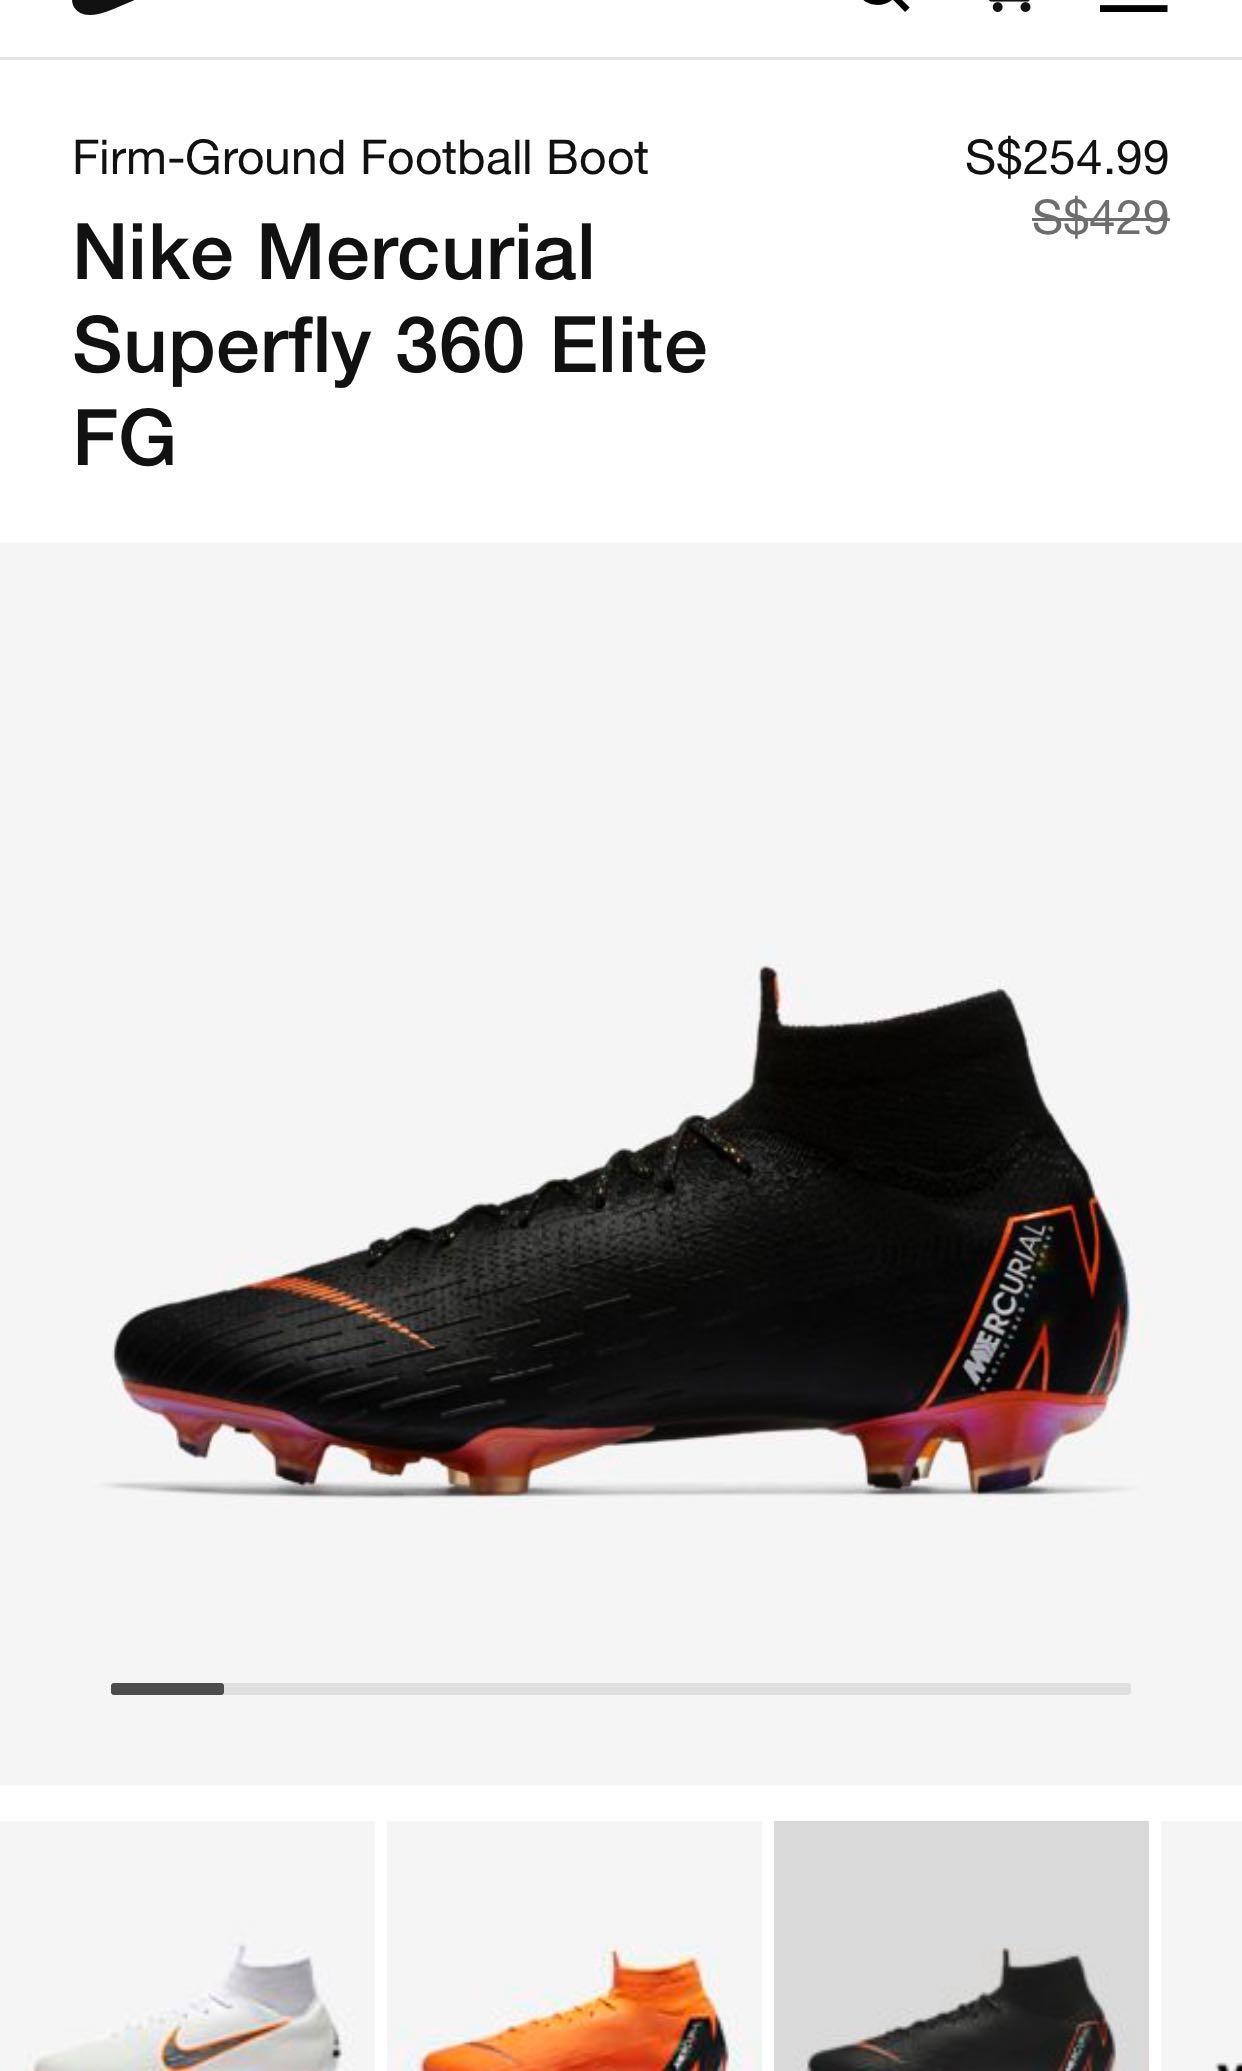 77215db9eaf26 Nike mercurial superfly 360 elite FG, Men's Fashion, Footwear, Boots ...